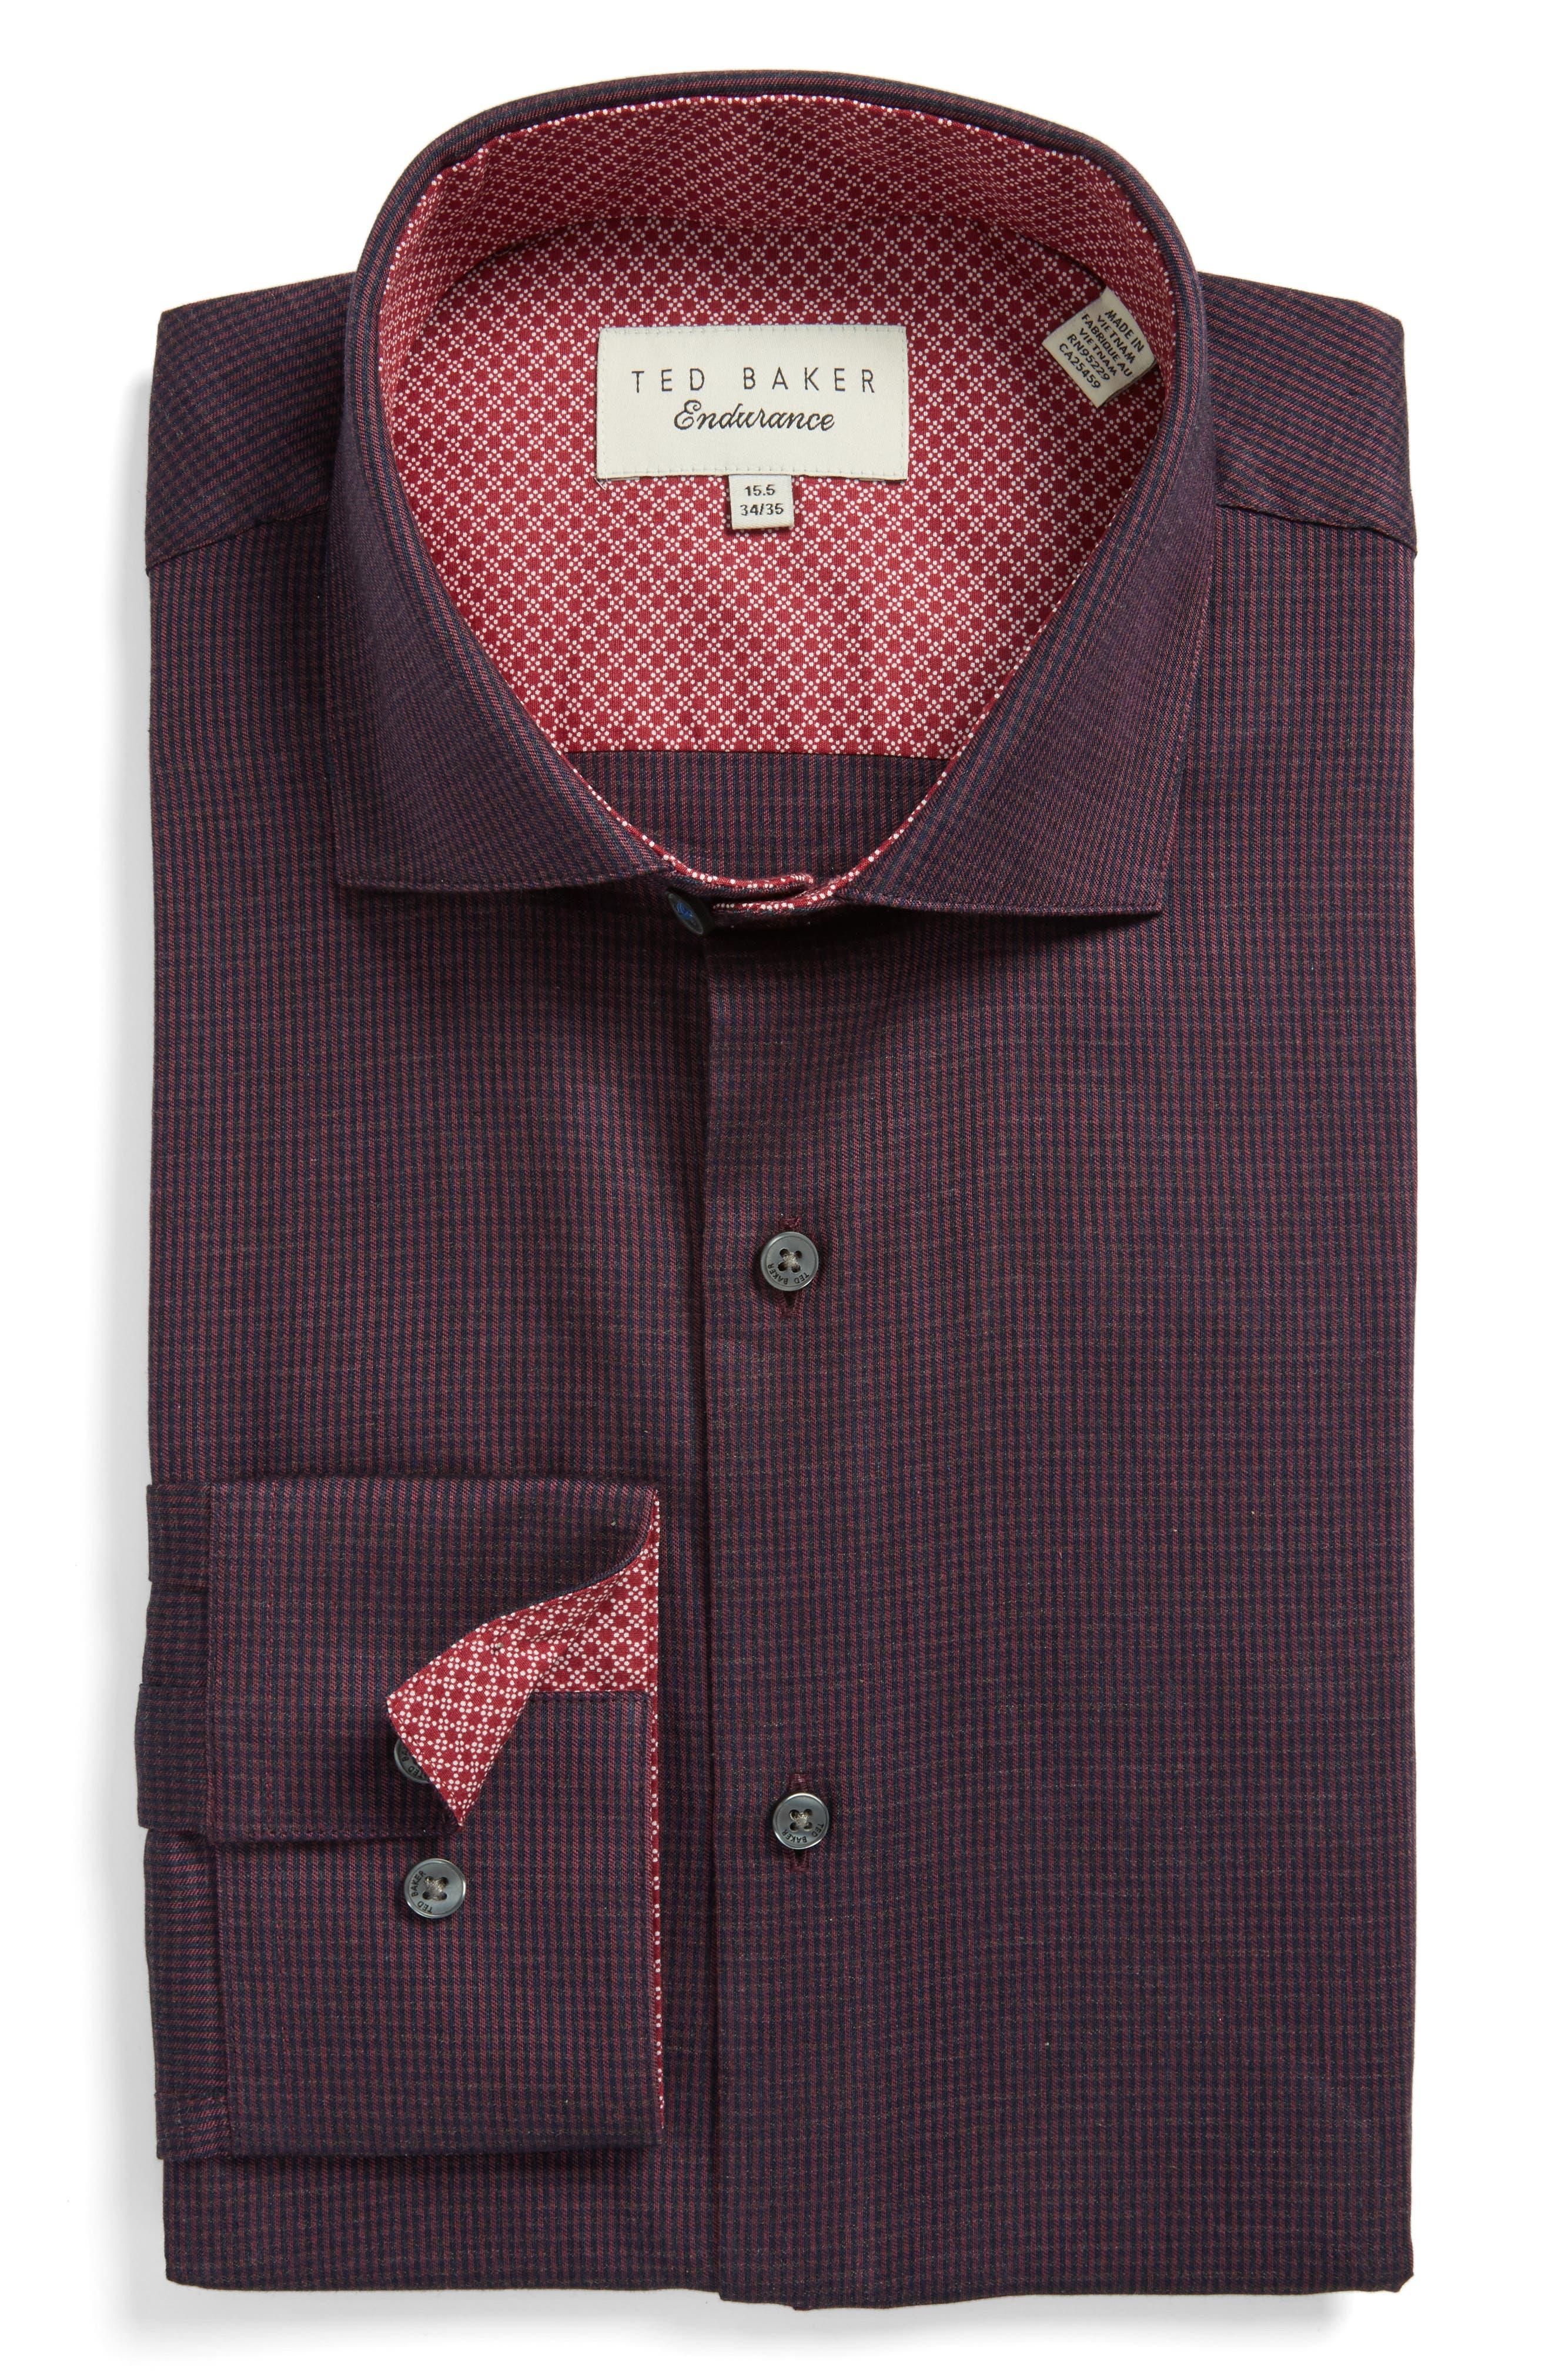 Ted Baker London Endurance Trim Fit Pattern Dress Shirt